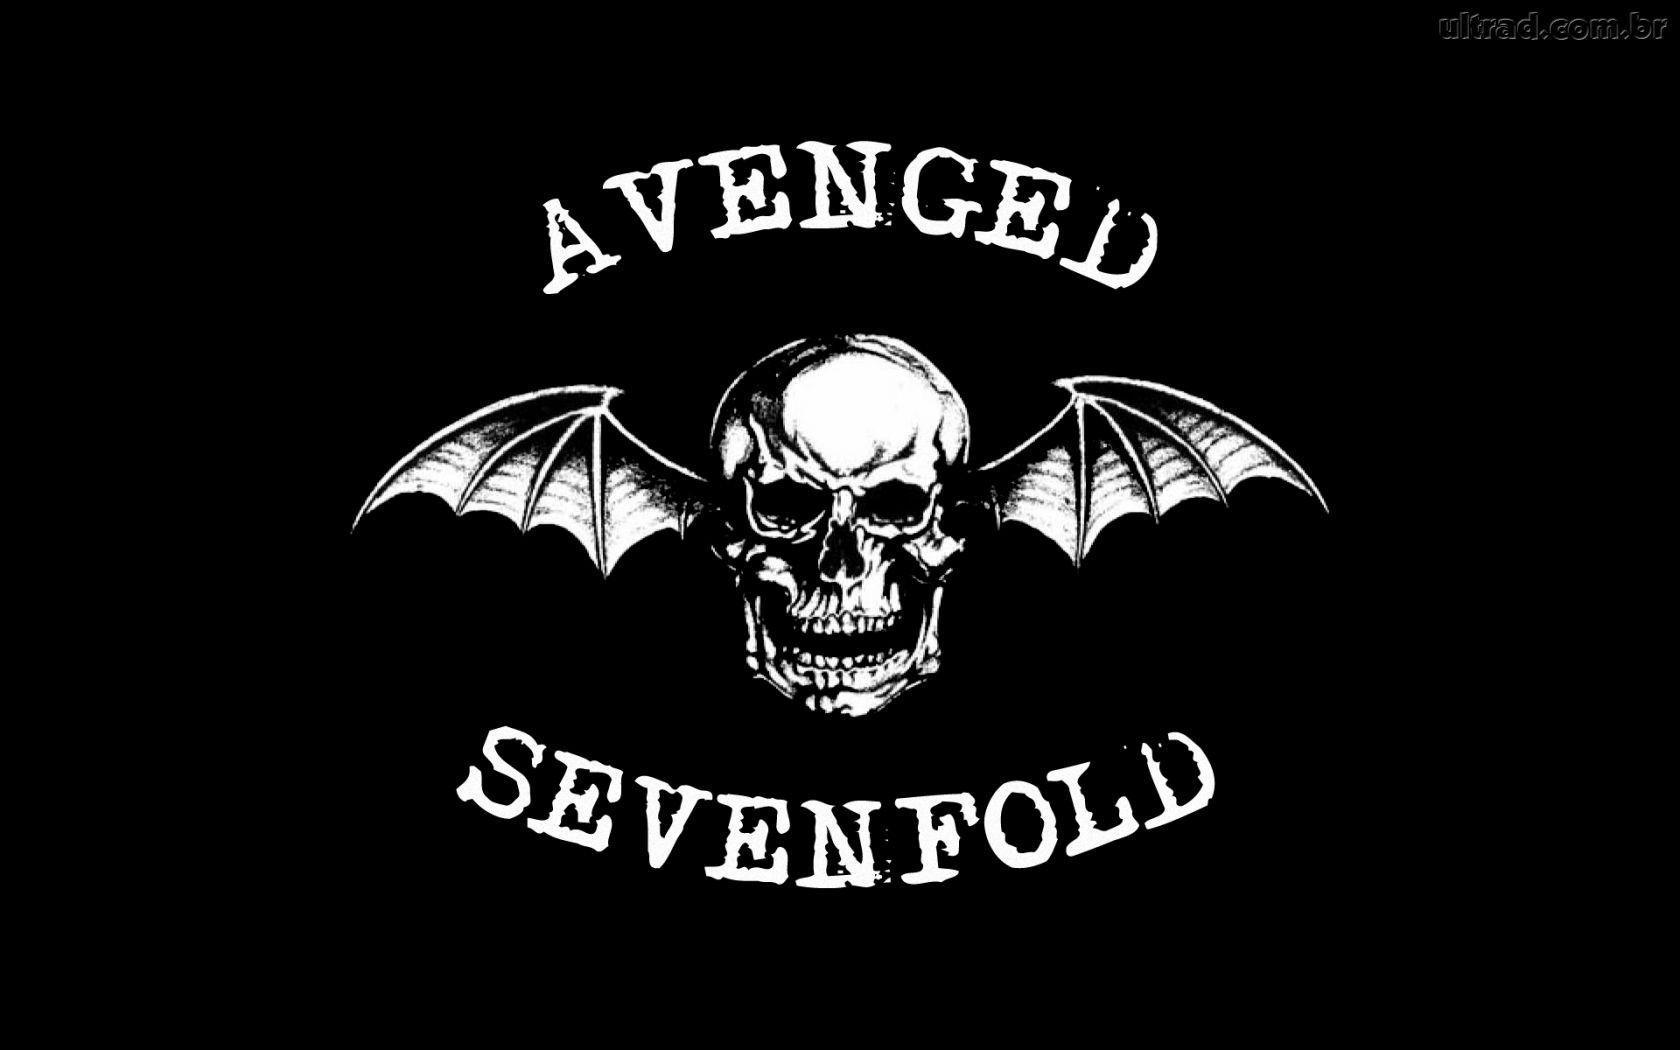 avenged sevenfold 2015 wallpapers